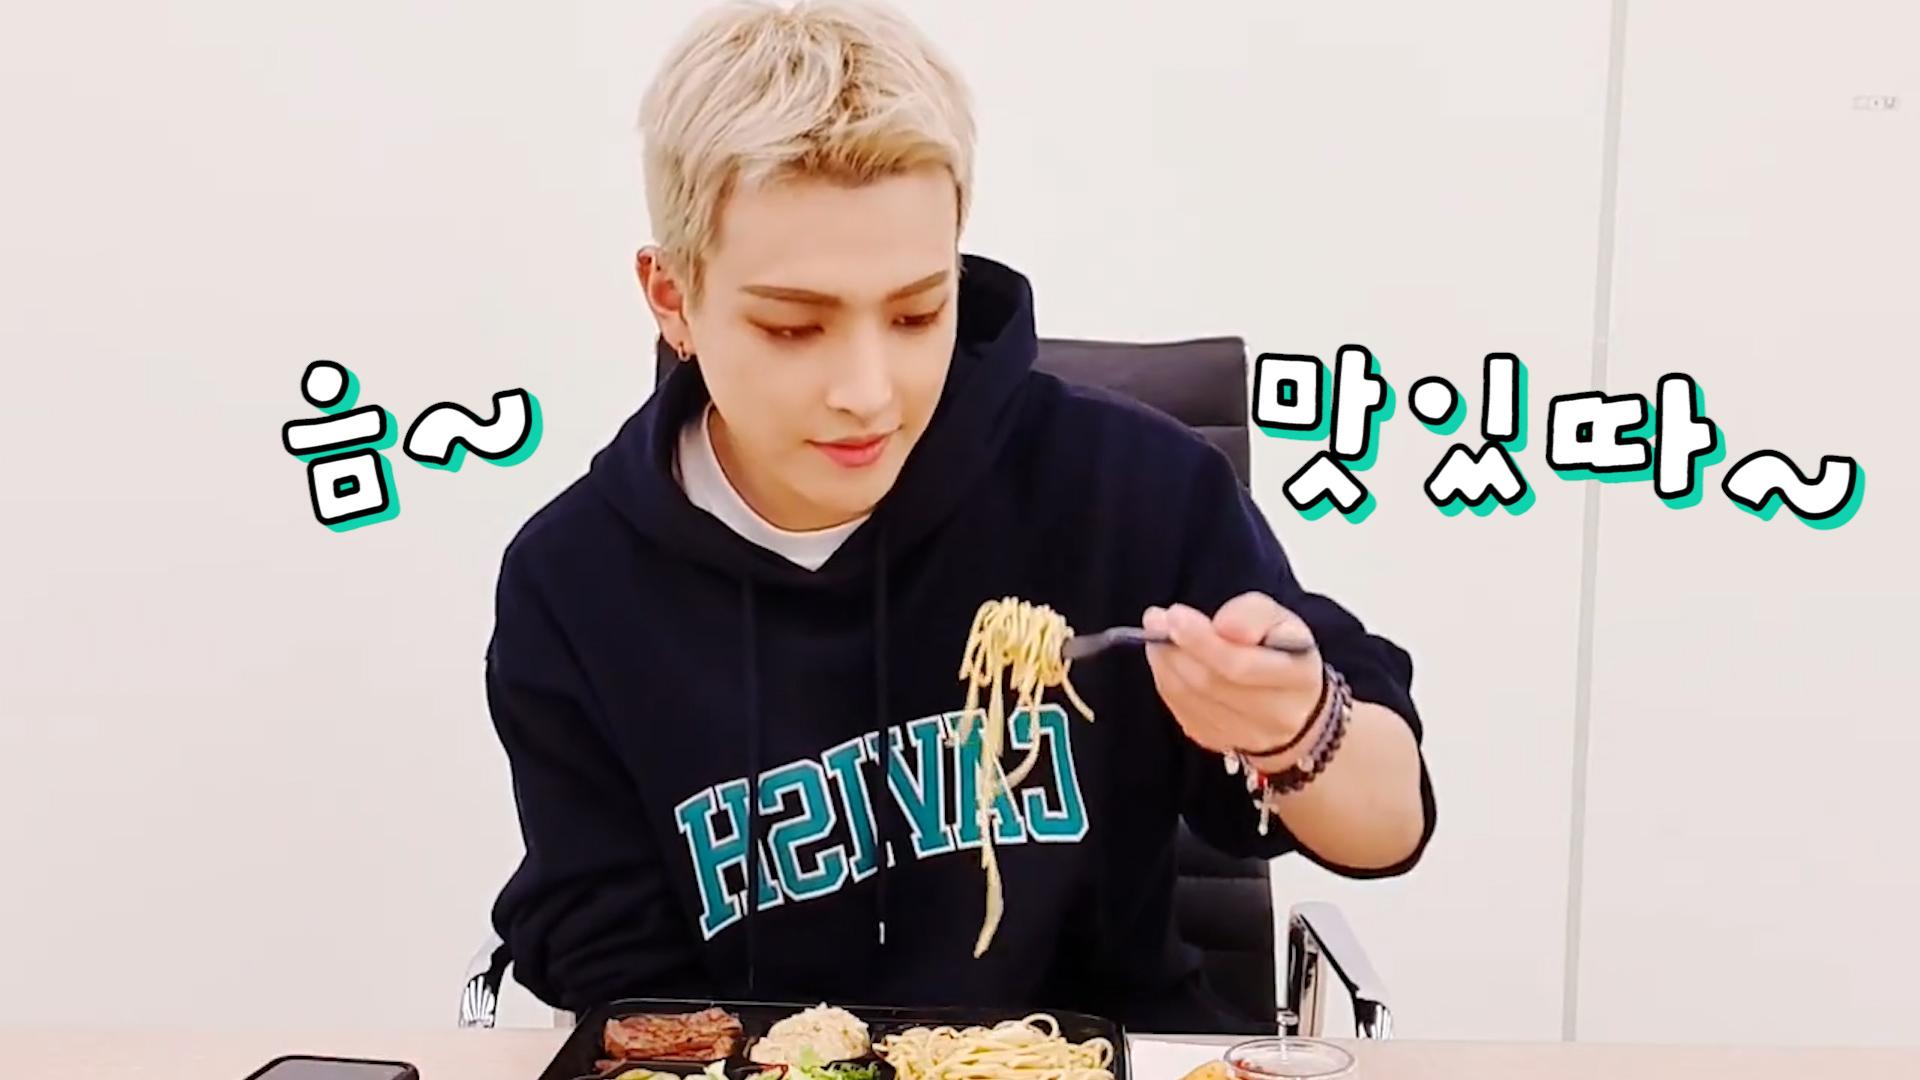 [ATEEZ] 식사와 혈중김홍중농도를 챙겨주는 최고의 아이돌🍝 (HONGJOONG eating steak&pasta)